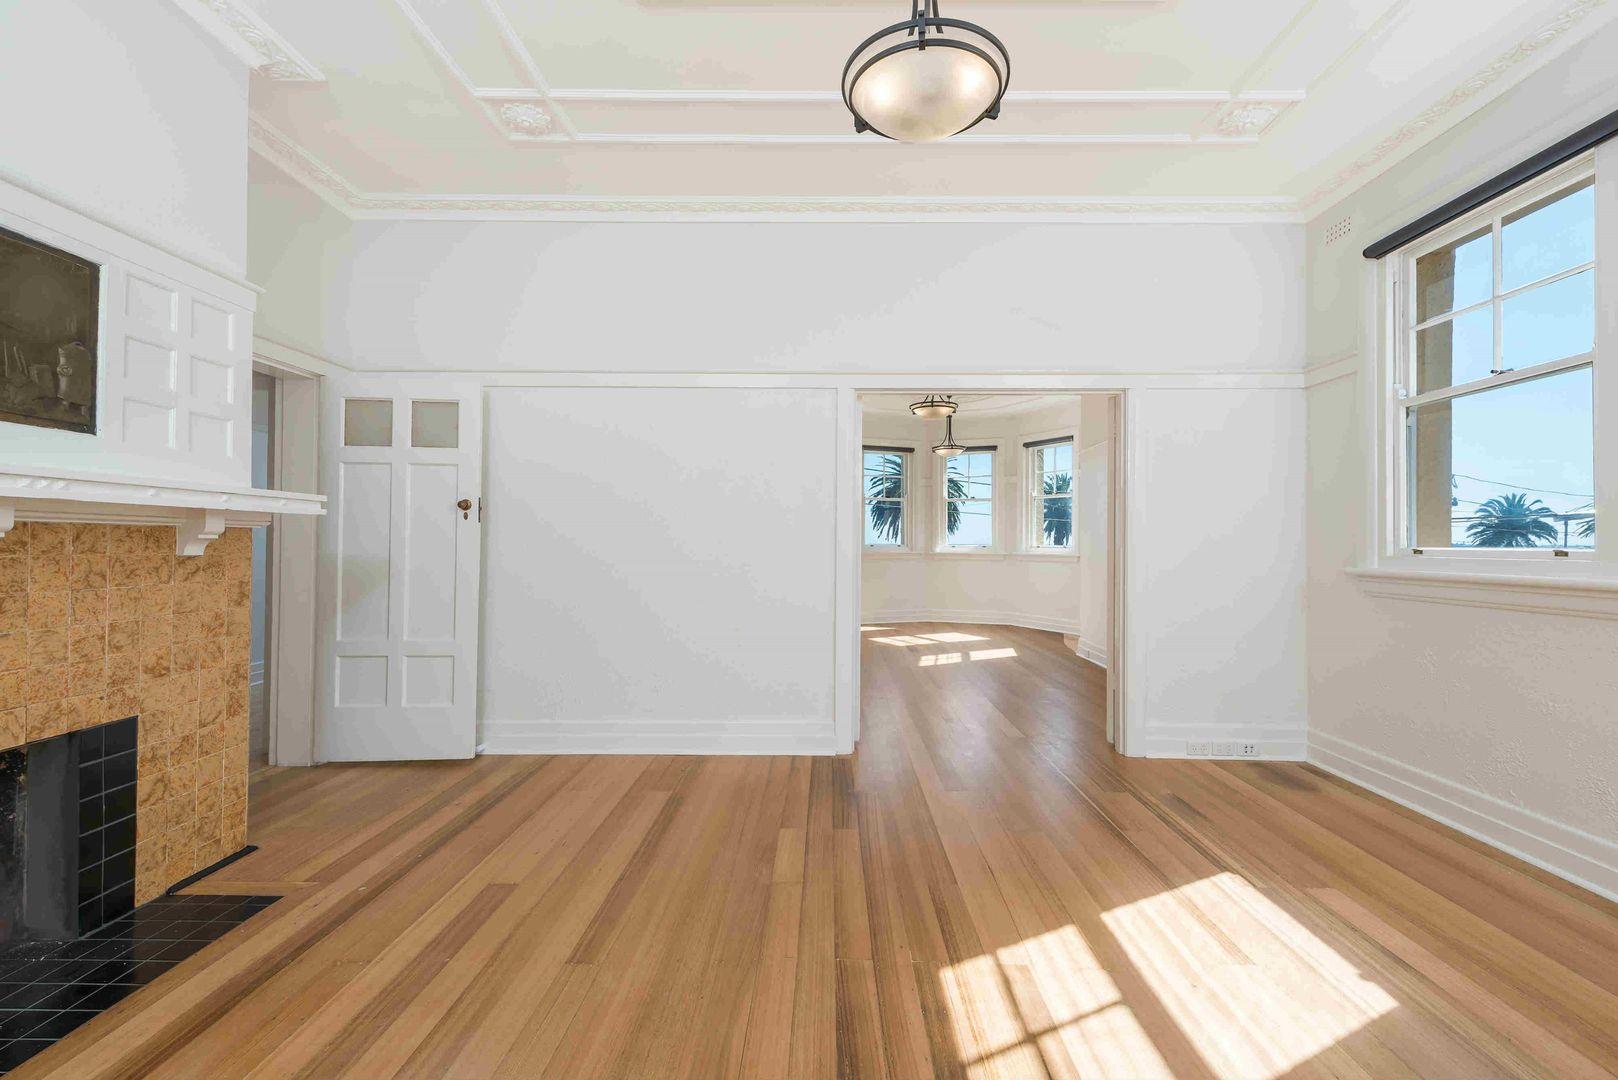 Property Report For 1 22 The Esplanade St Kilda Vic 3182